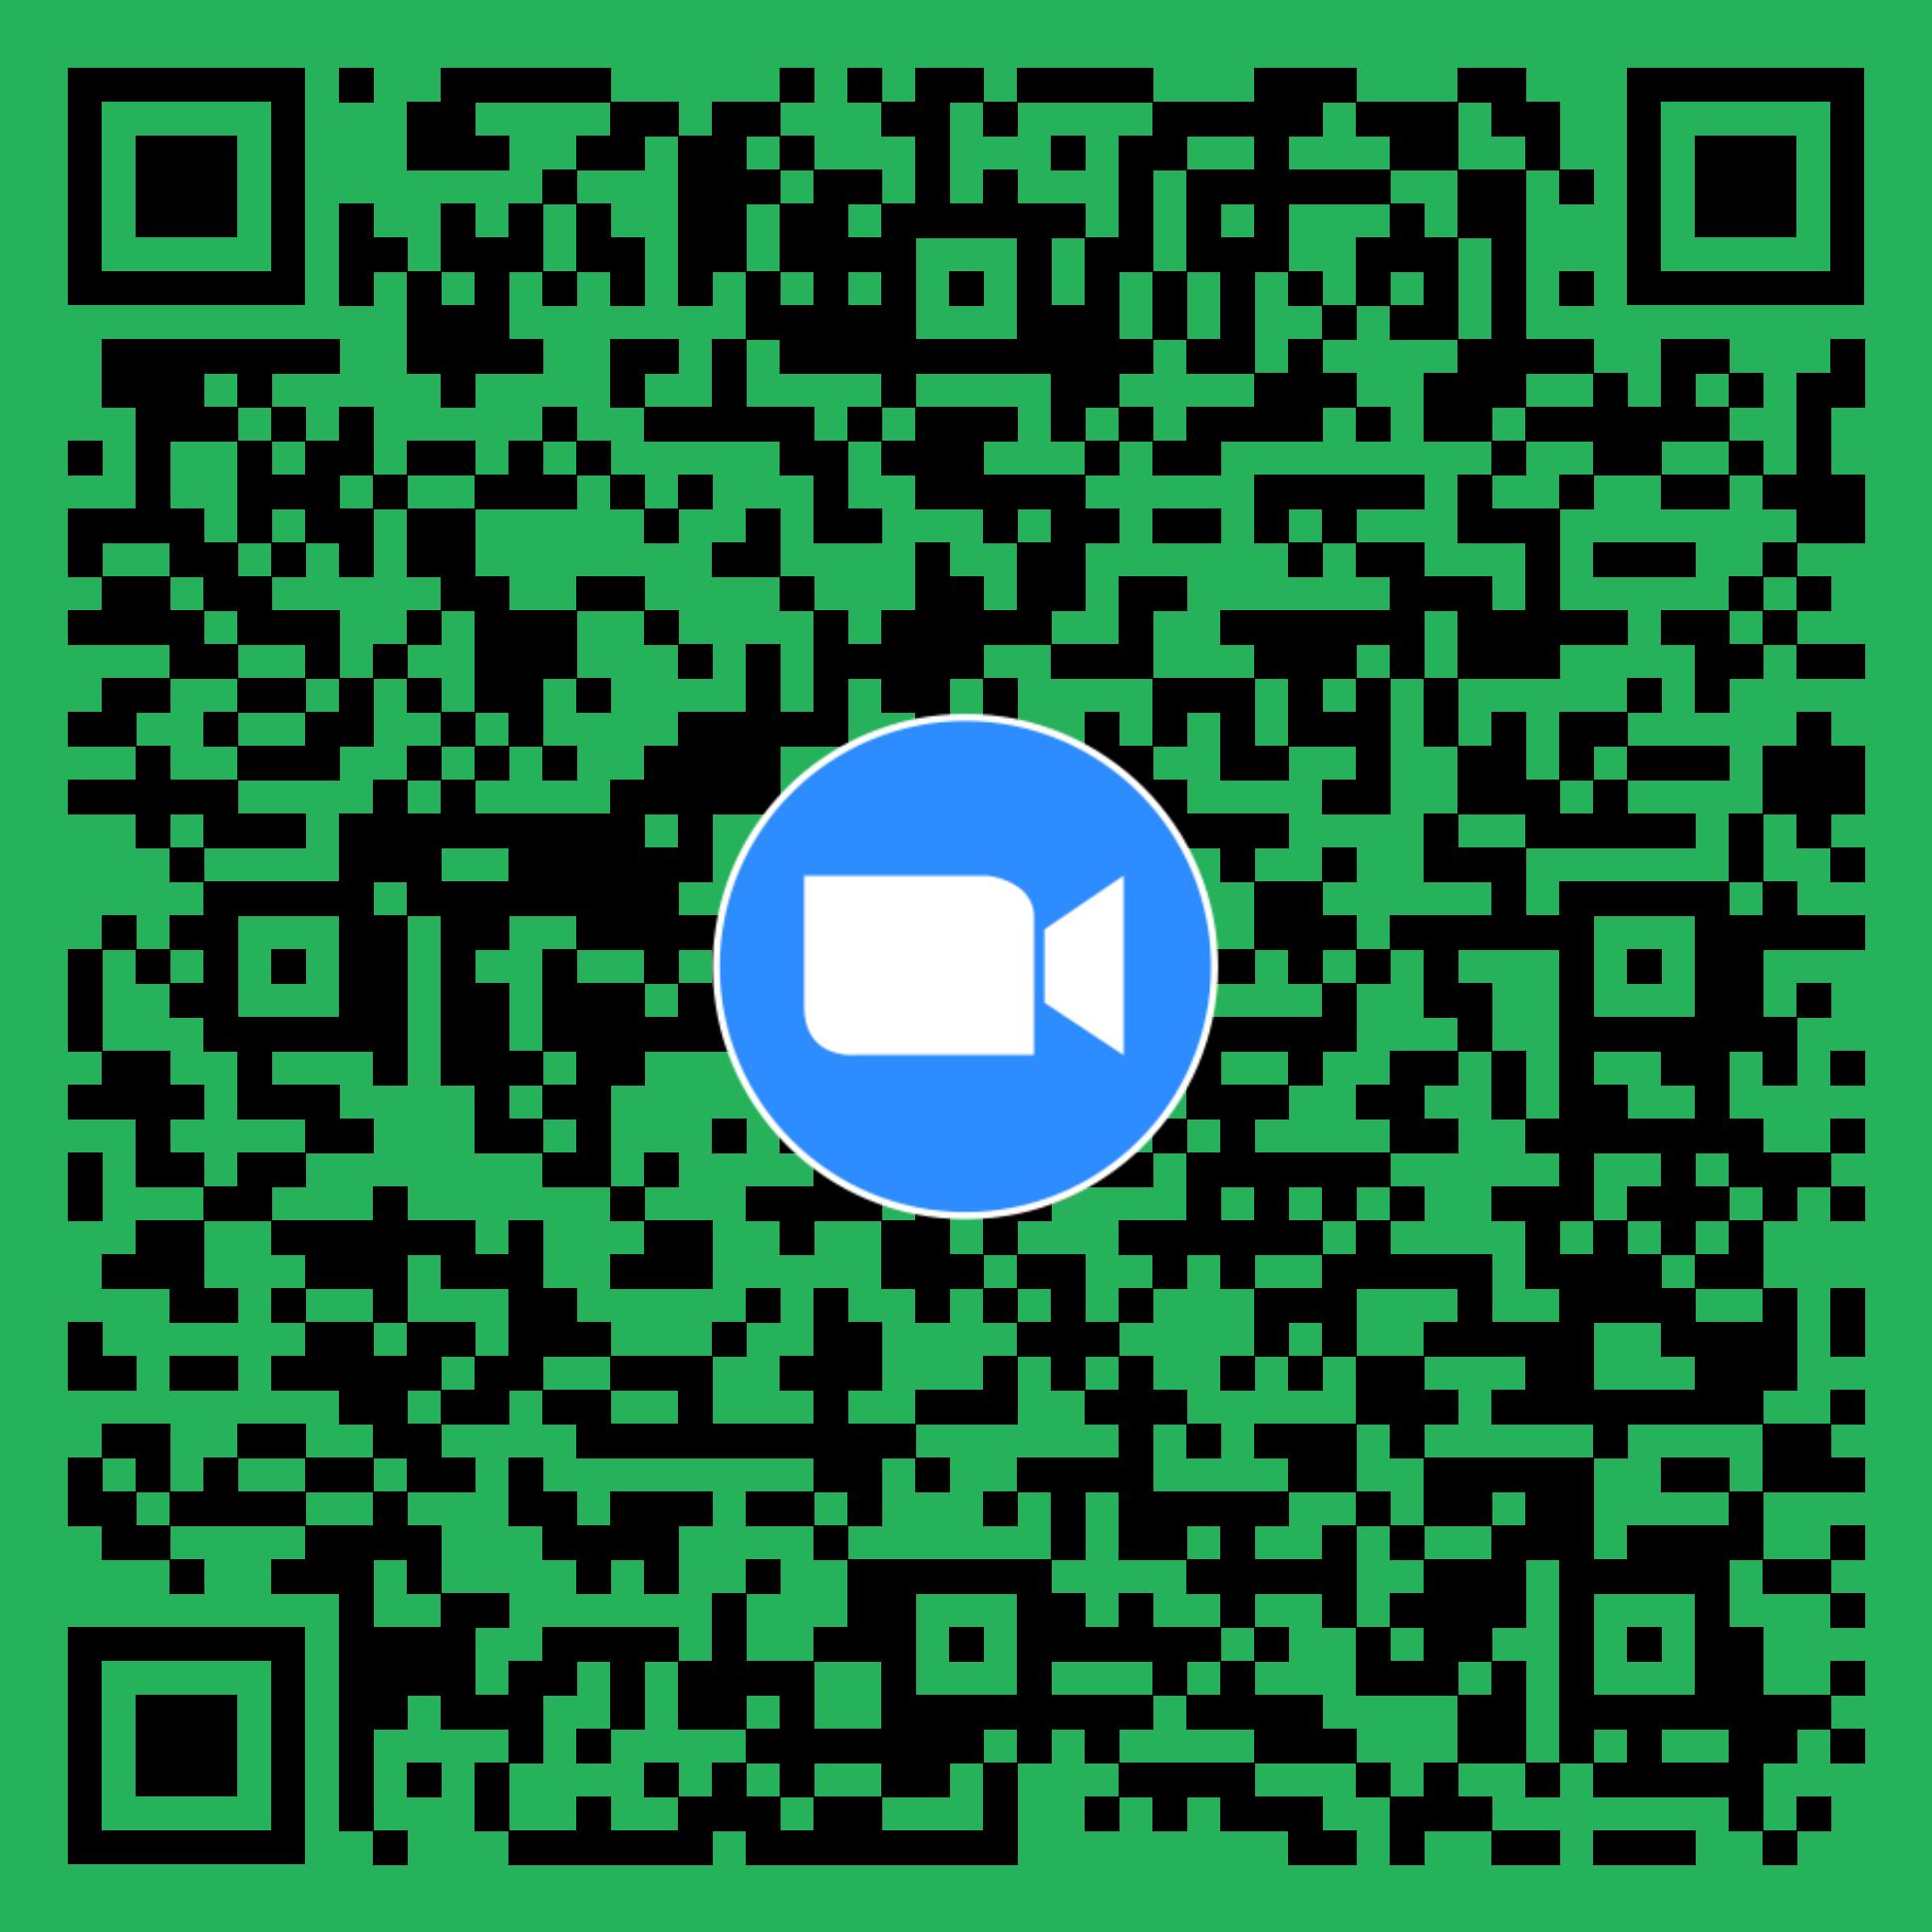 qr-codevideoselbstanleitungroche-selbsttest.png